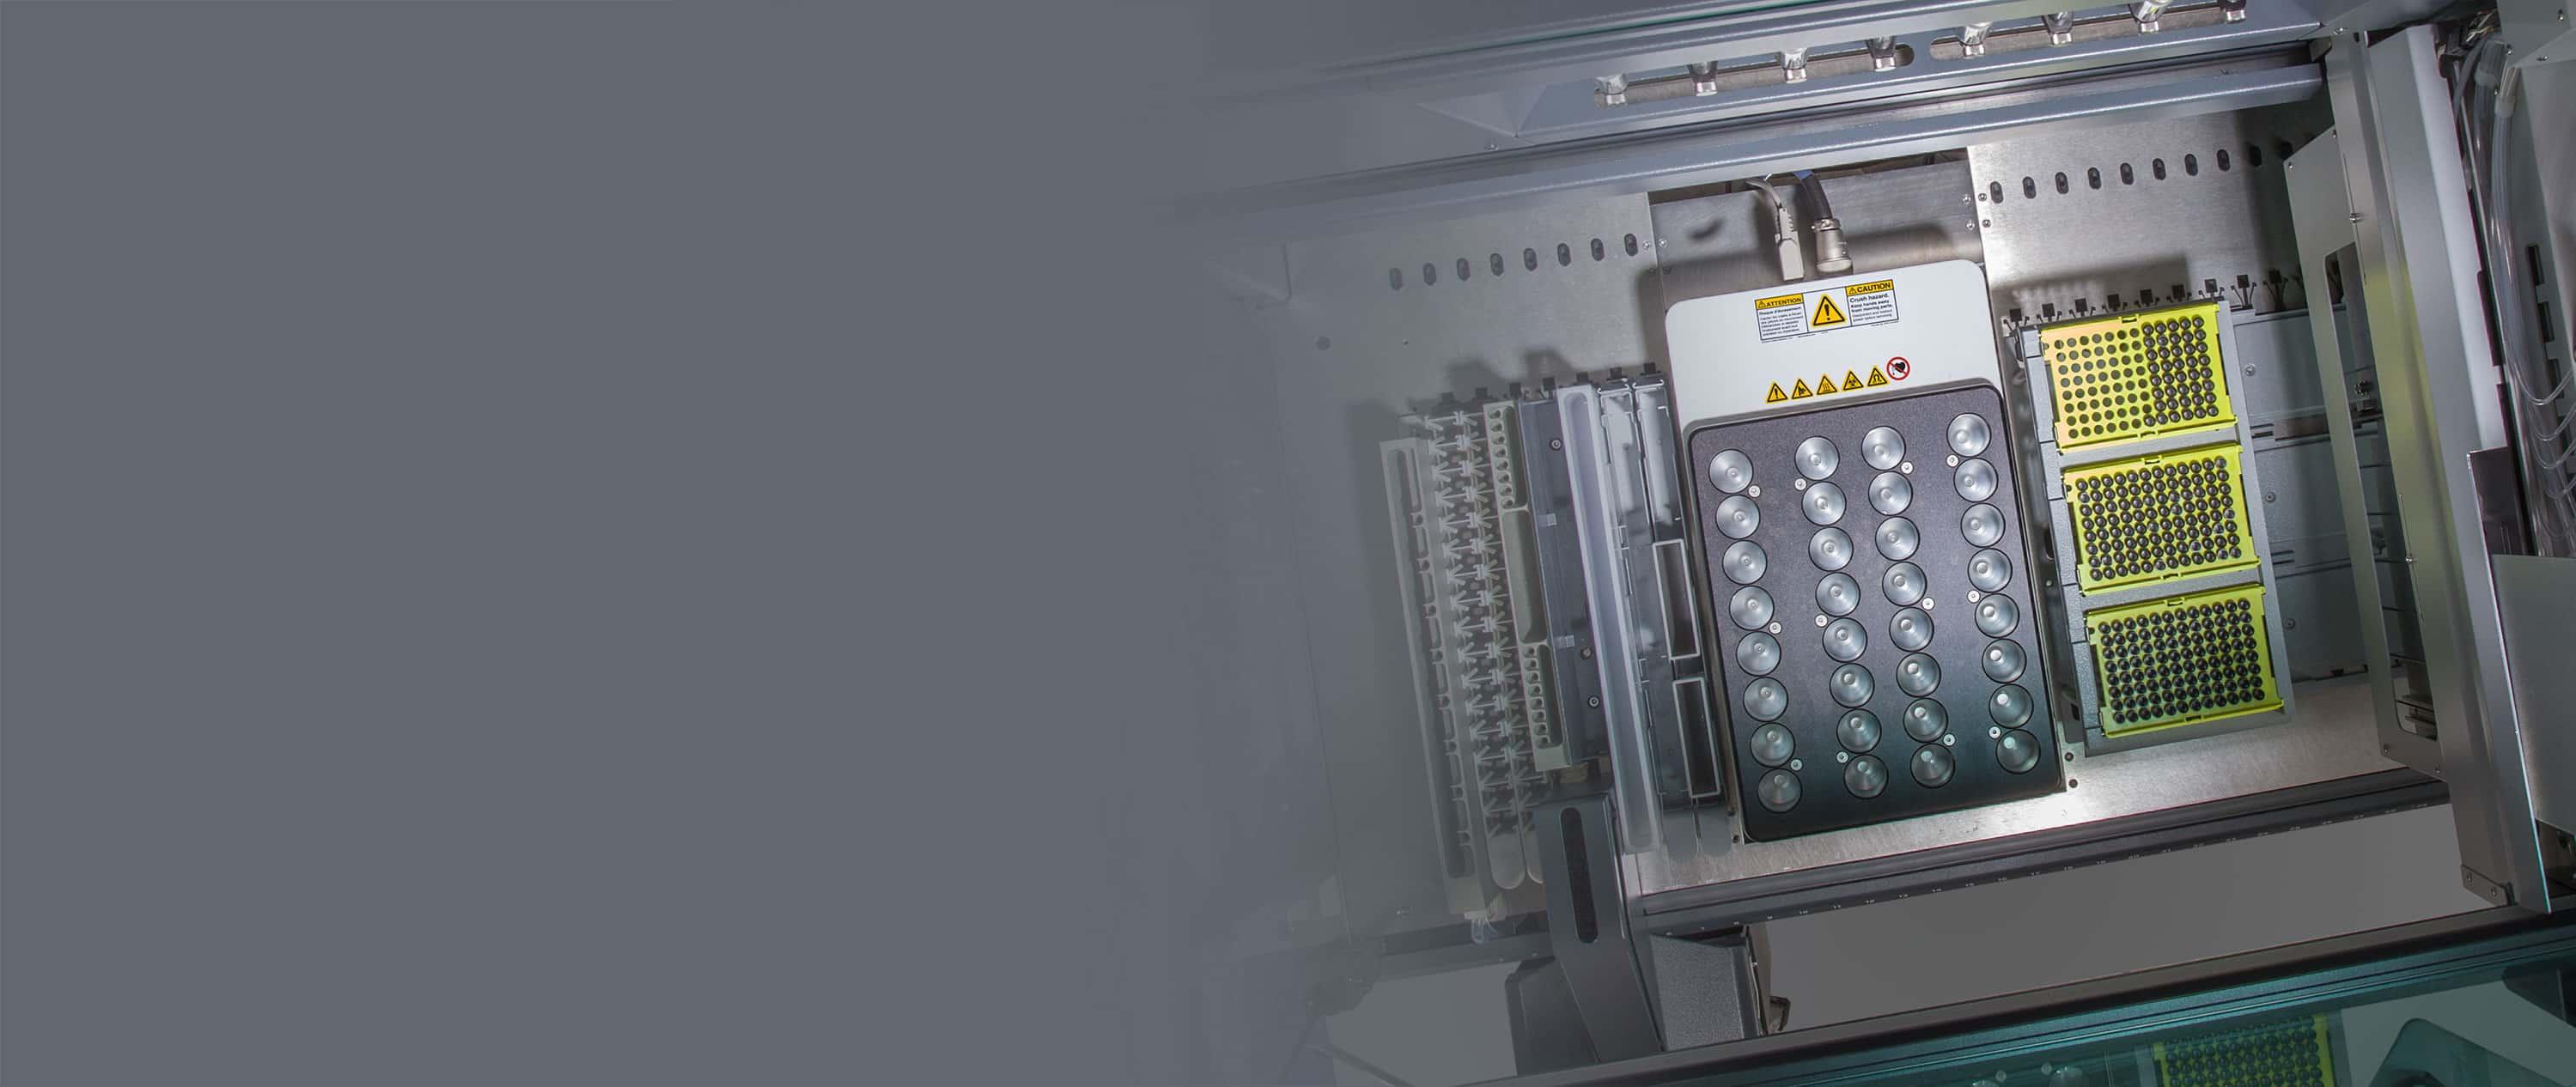 HSM-2_0-Overview-BKG